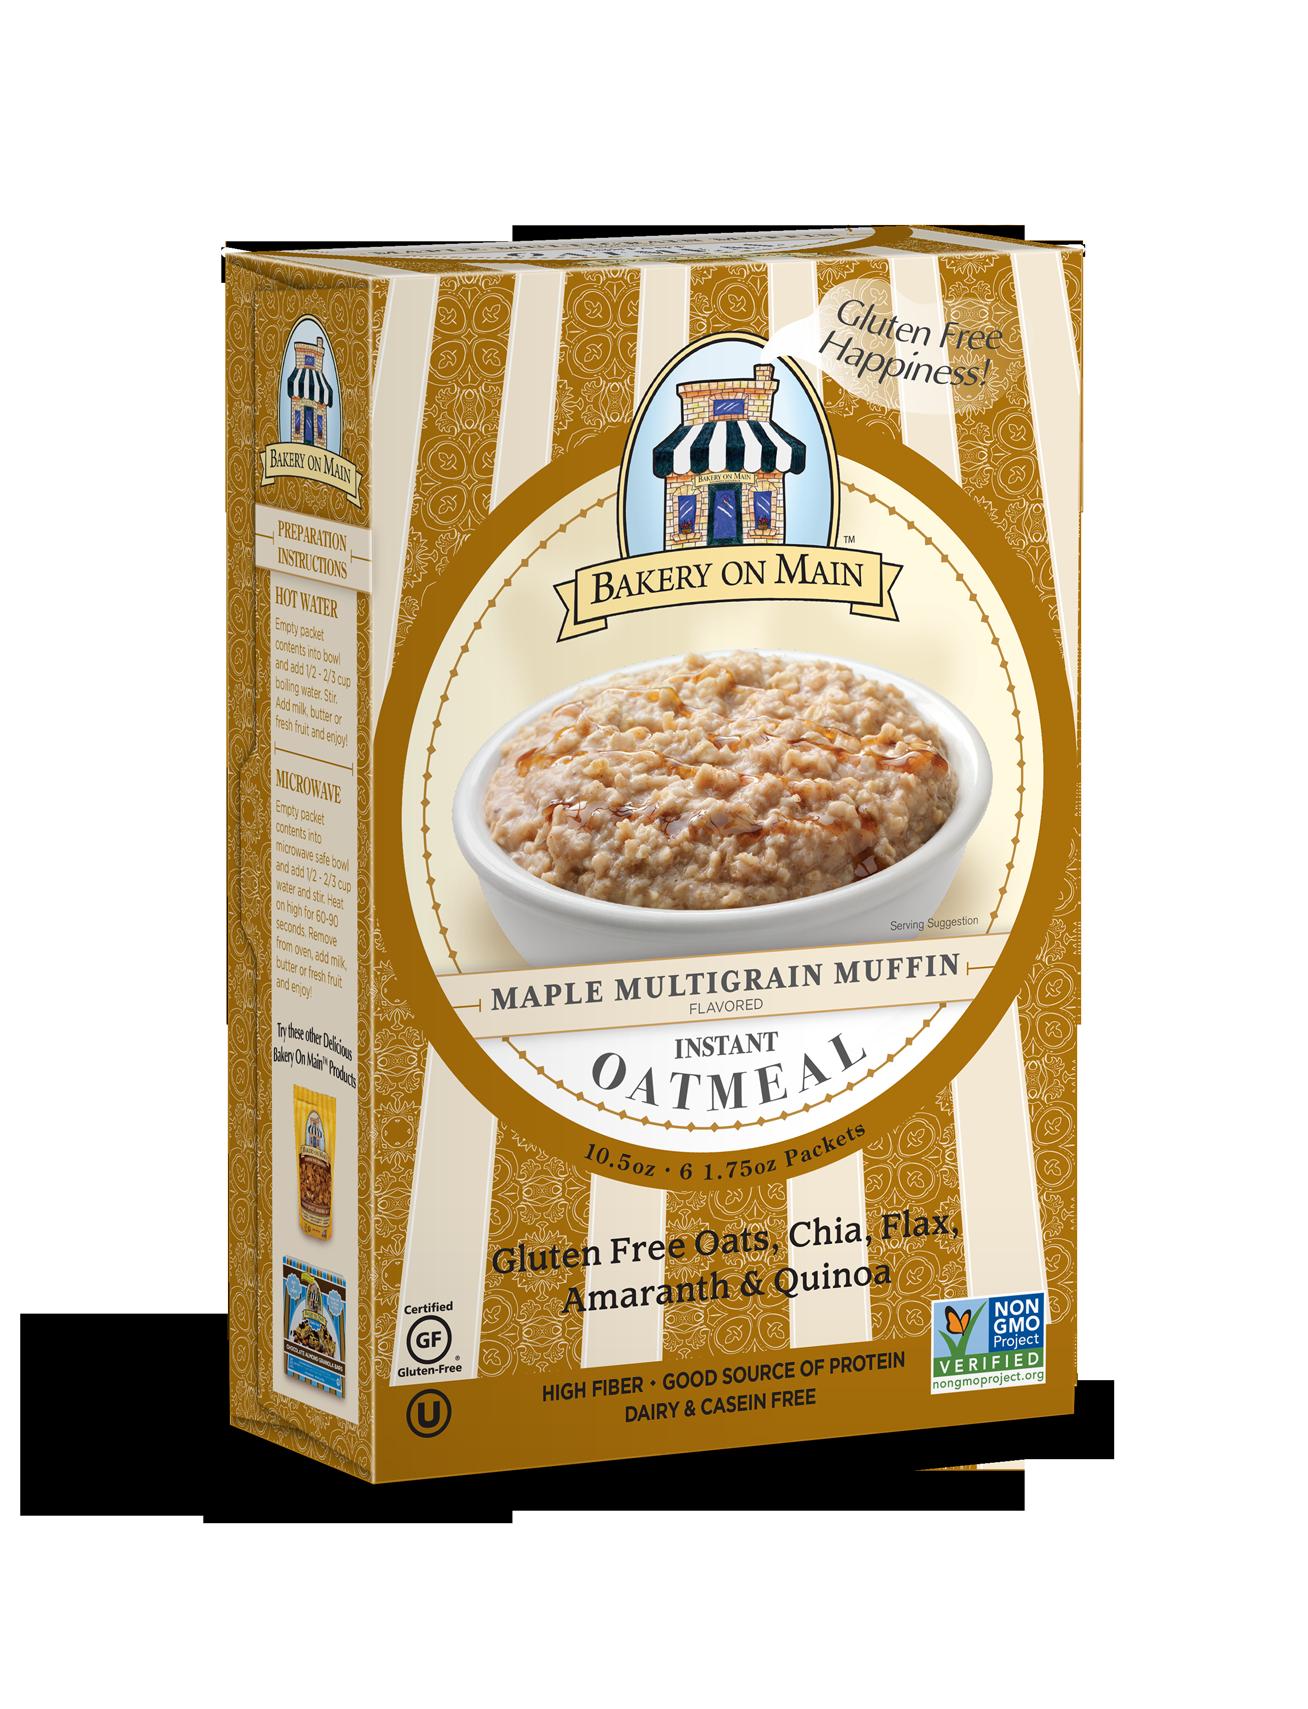 jpg royalty free library Grains clipart oats. Grain oatmeal box free